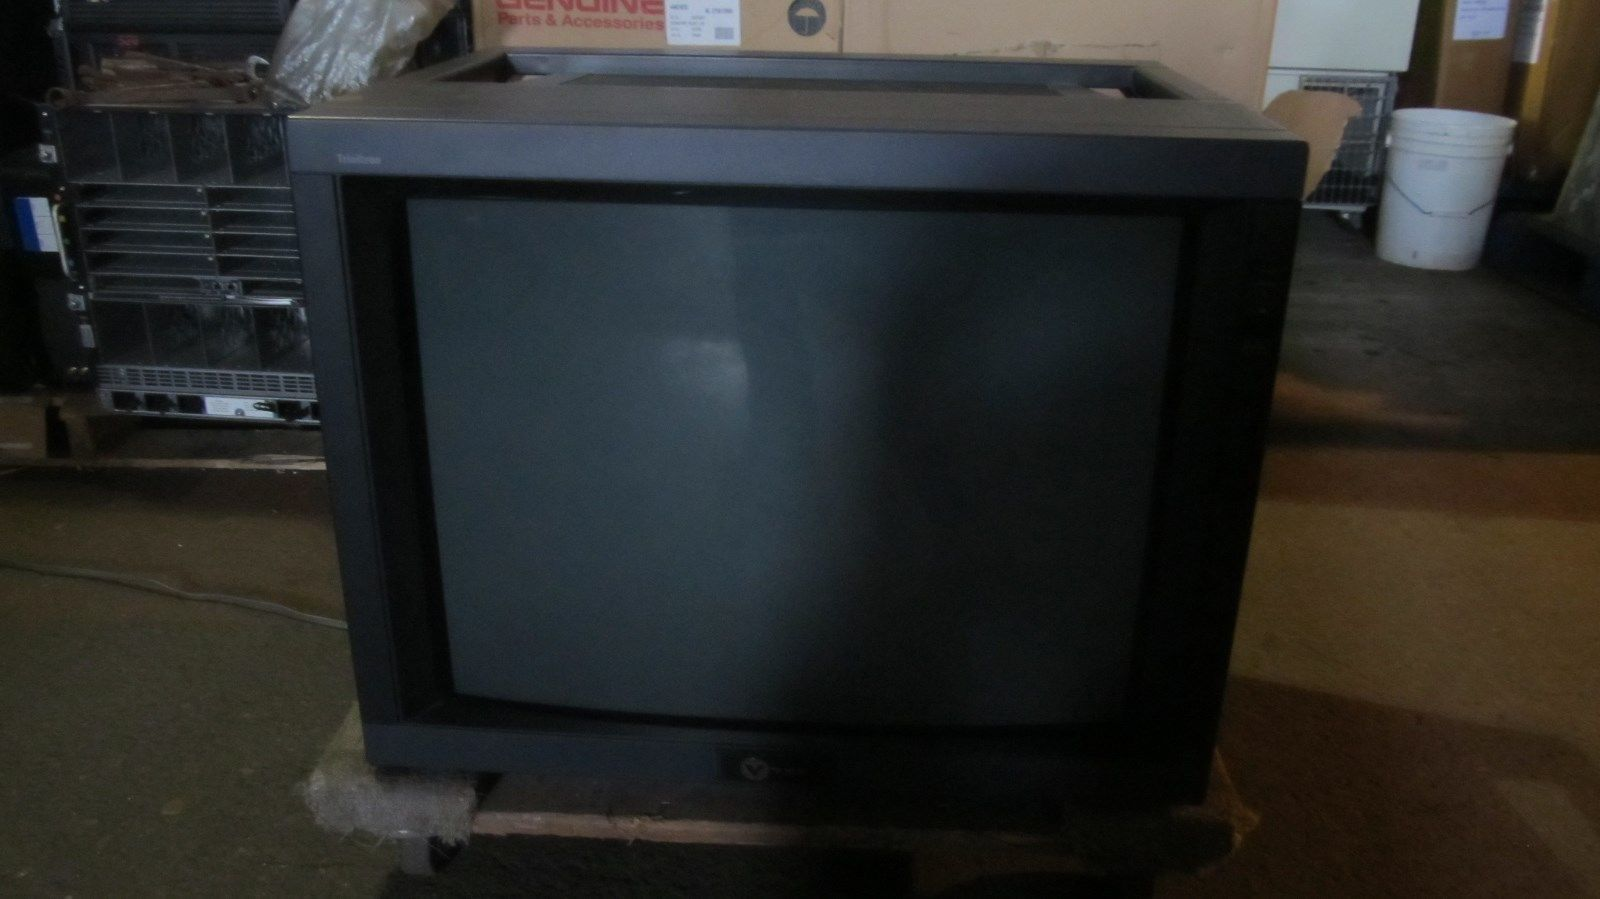 oem sony trinitron color video monitor model no pvm 2950q